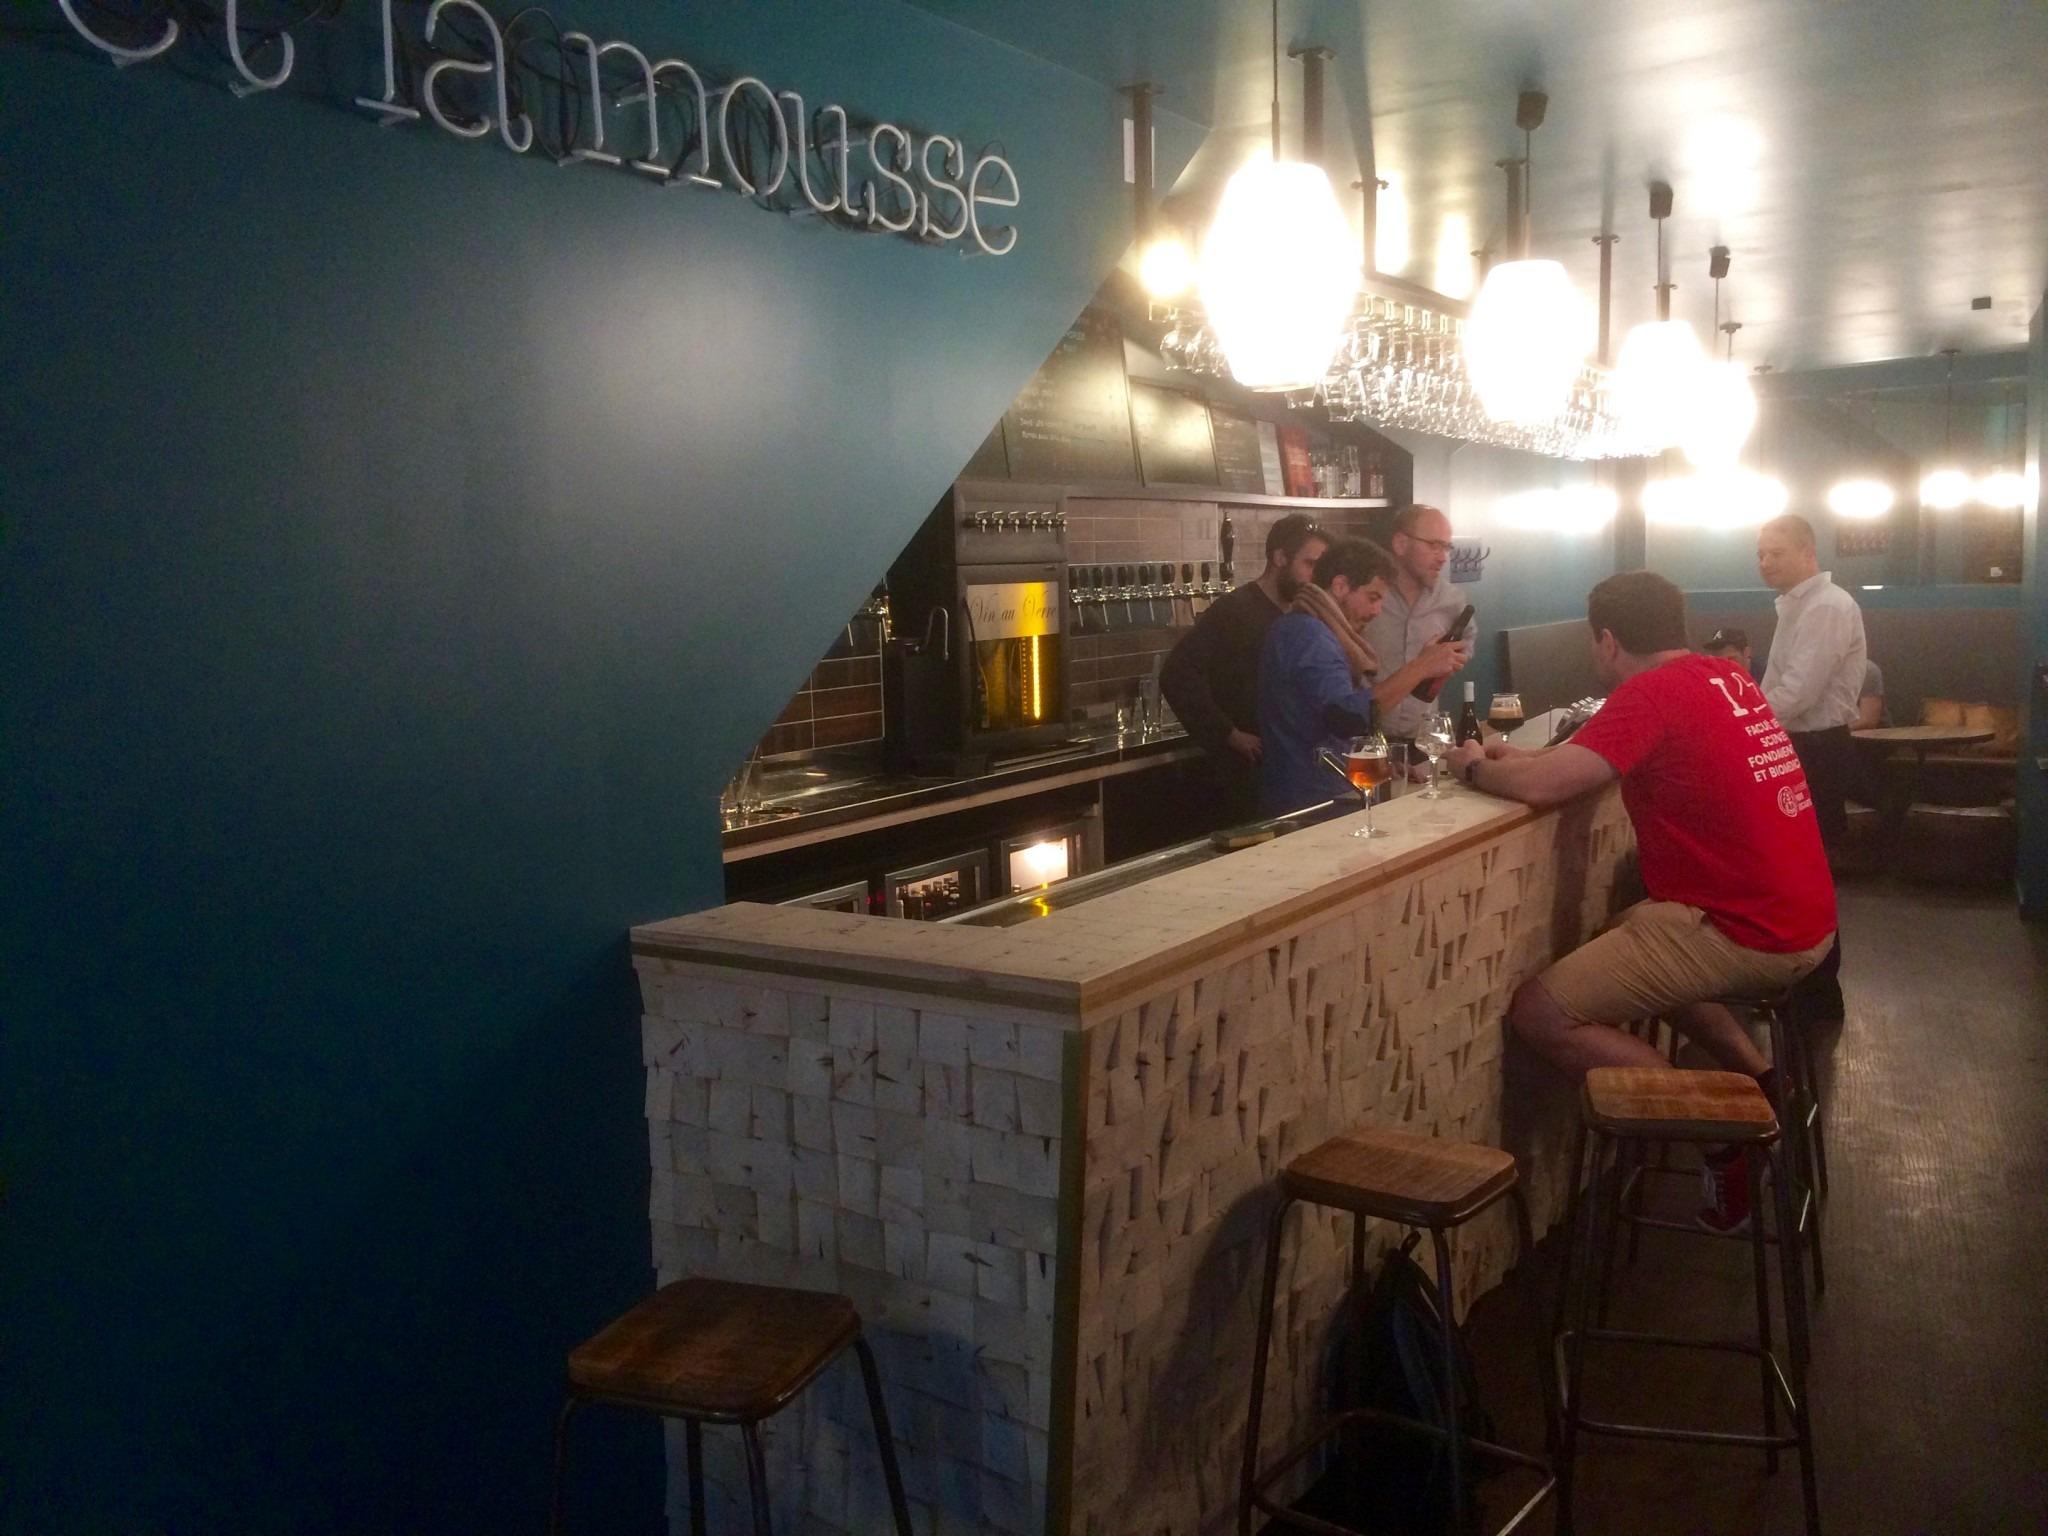 interior of craft beer bar in Paris